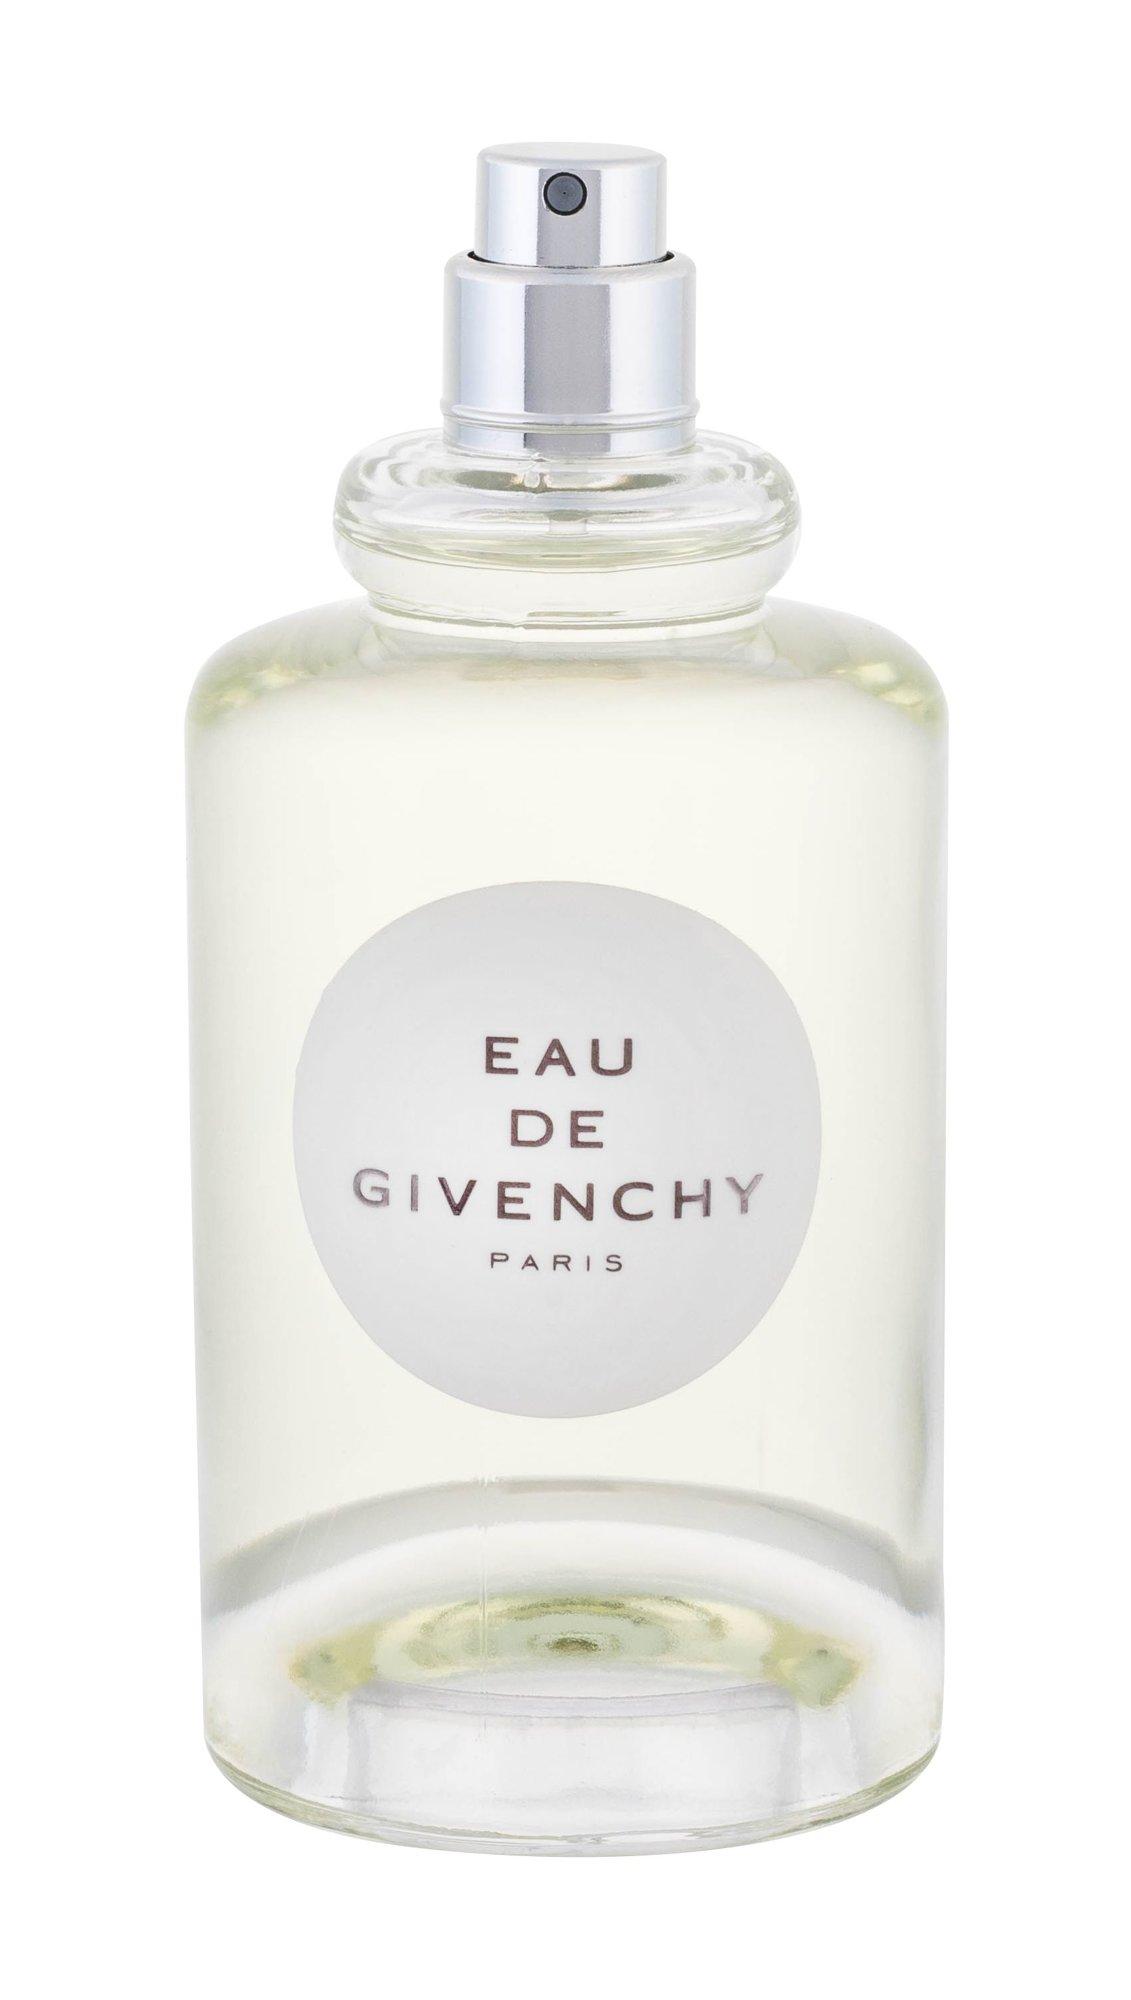 Givenchy Eau De Givenchy EDT 100ml